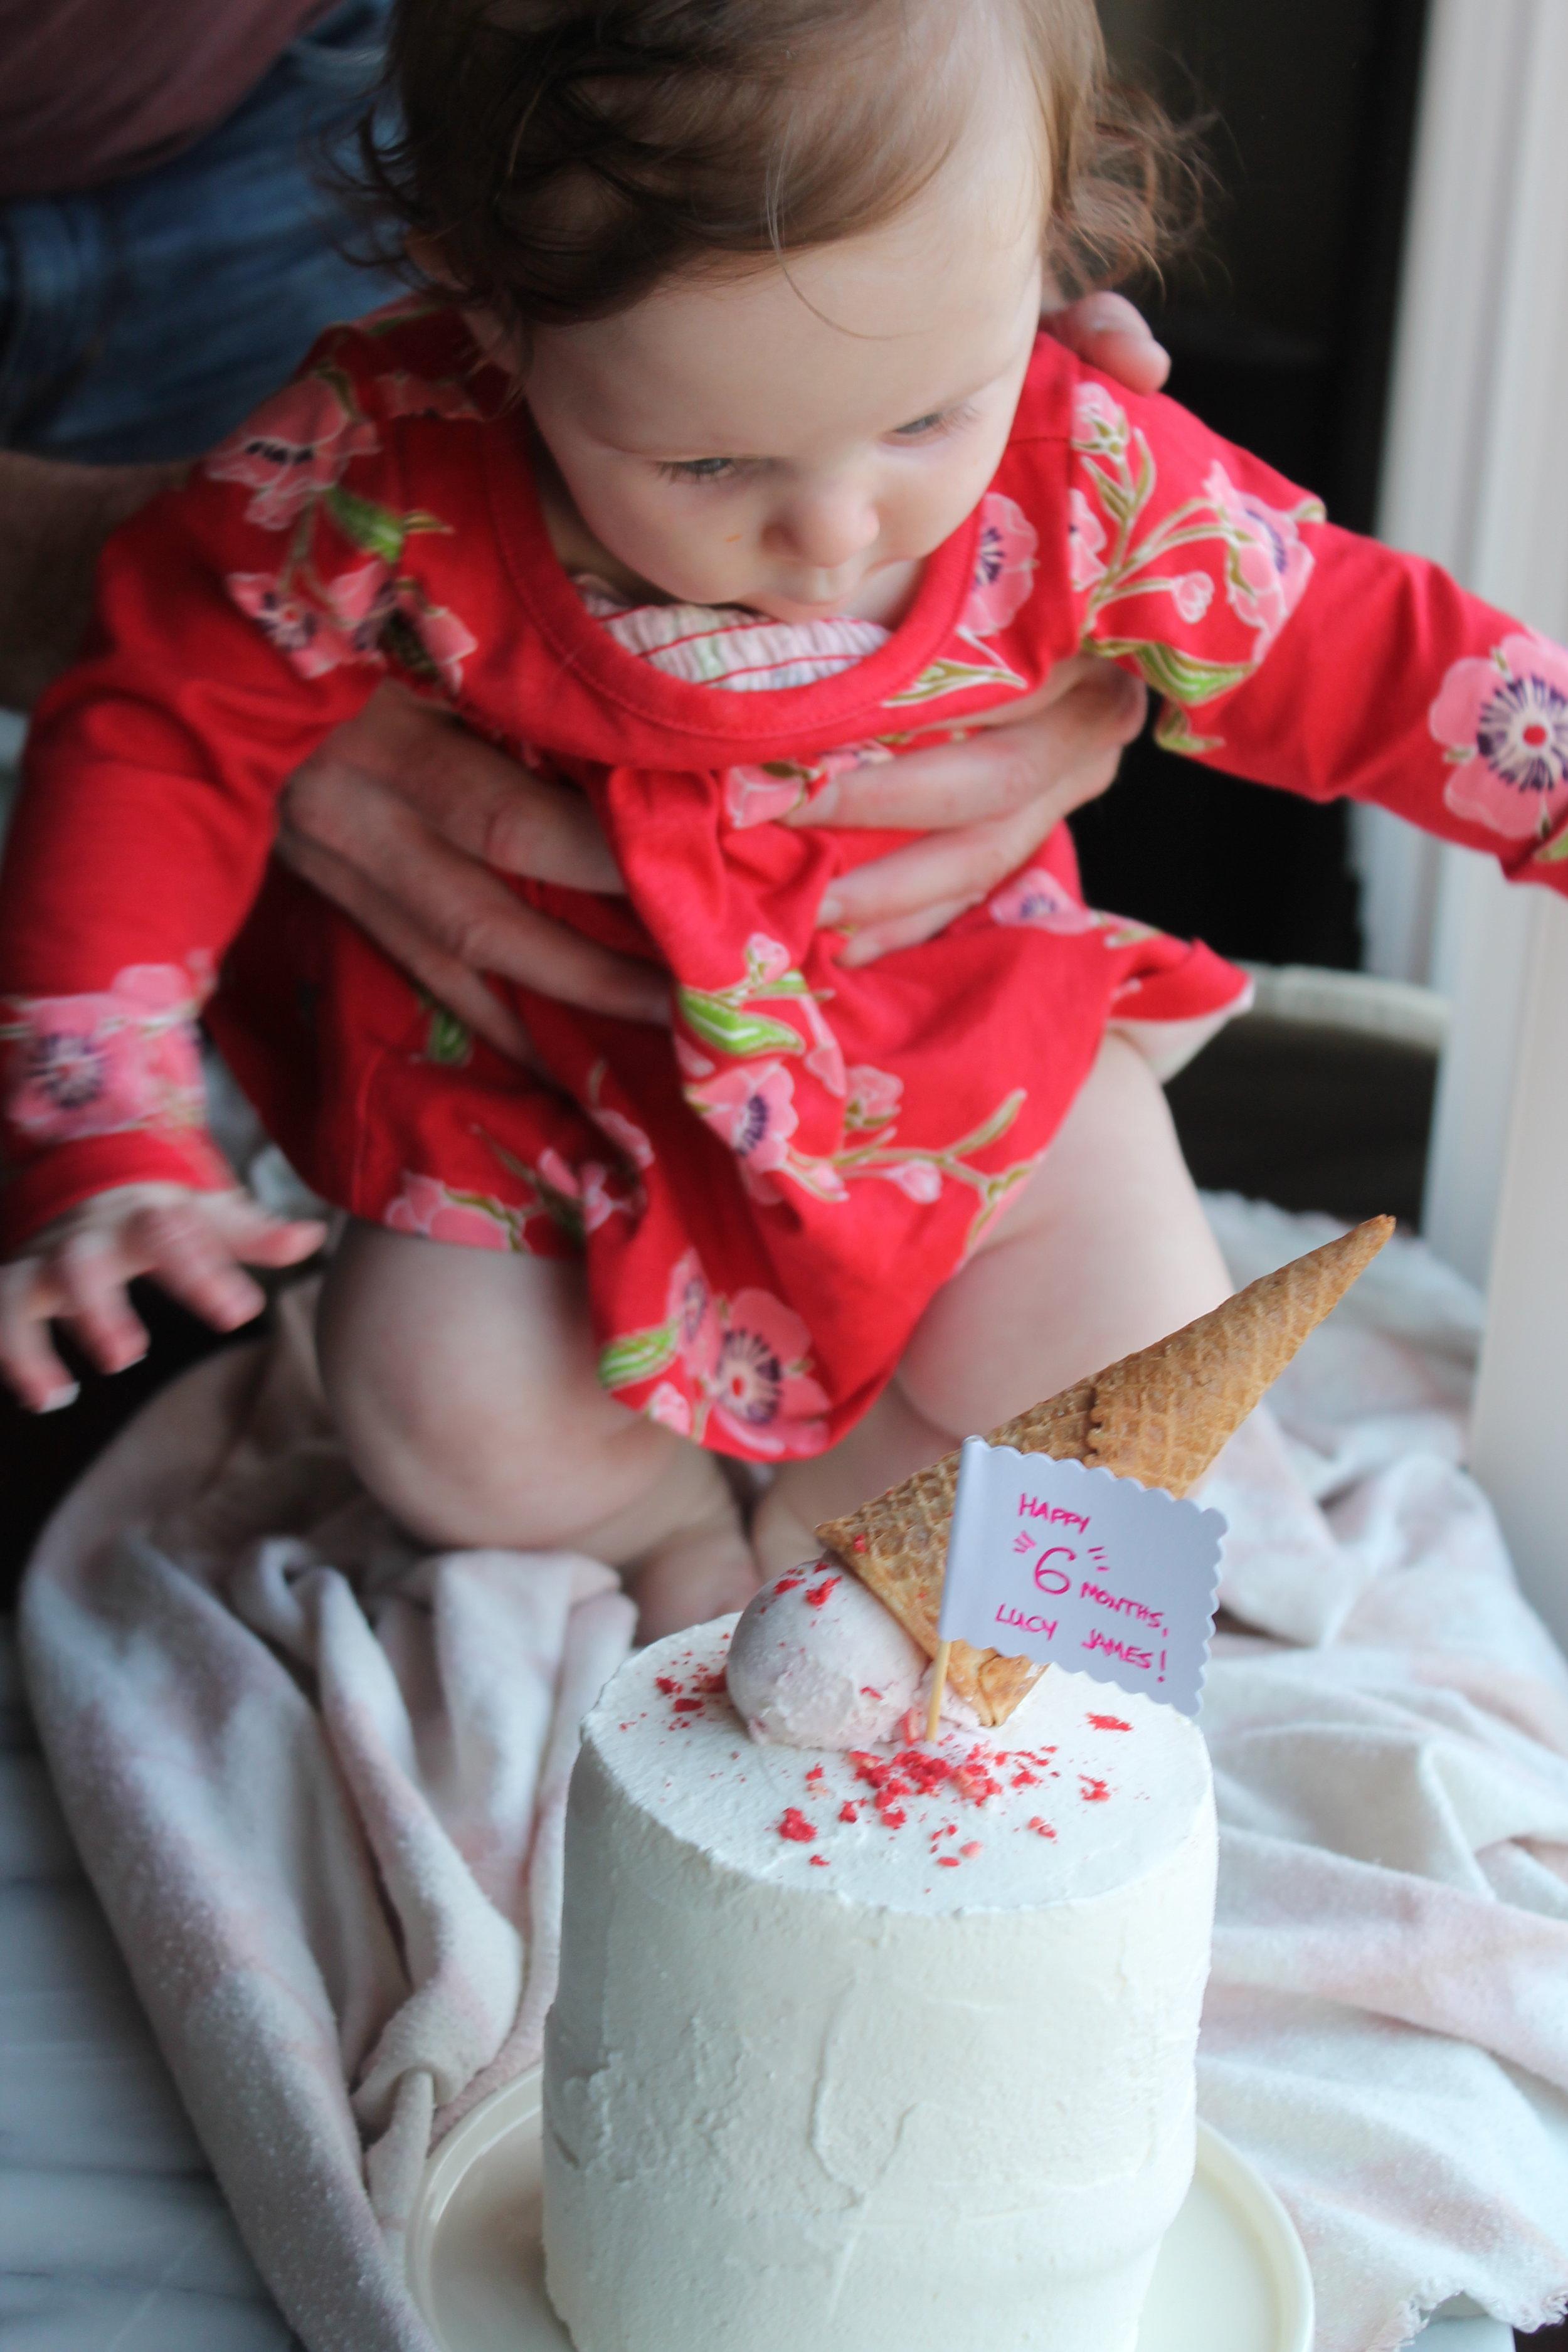 Month 6:  Neapolitan Ice Cream Cake